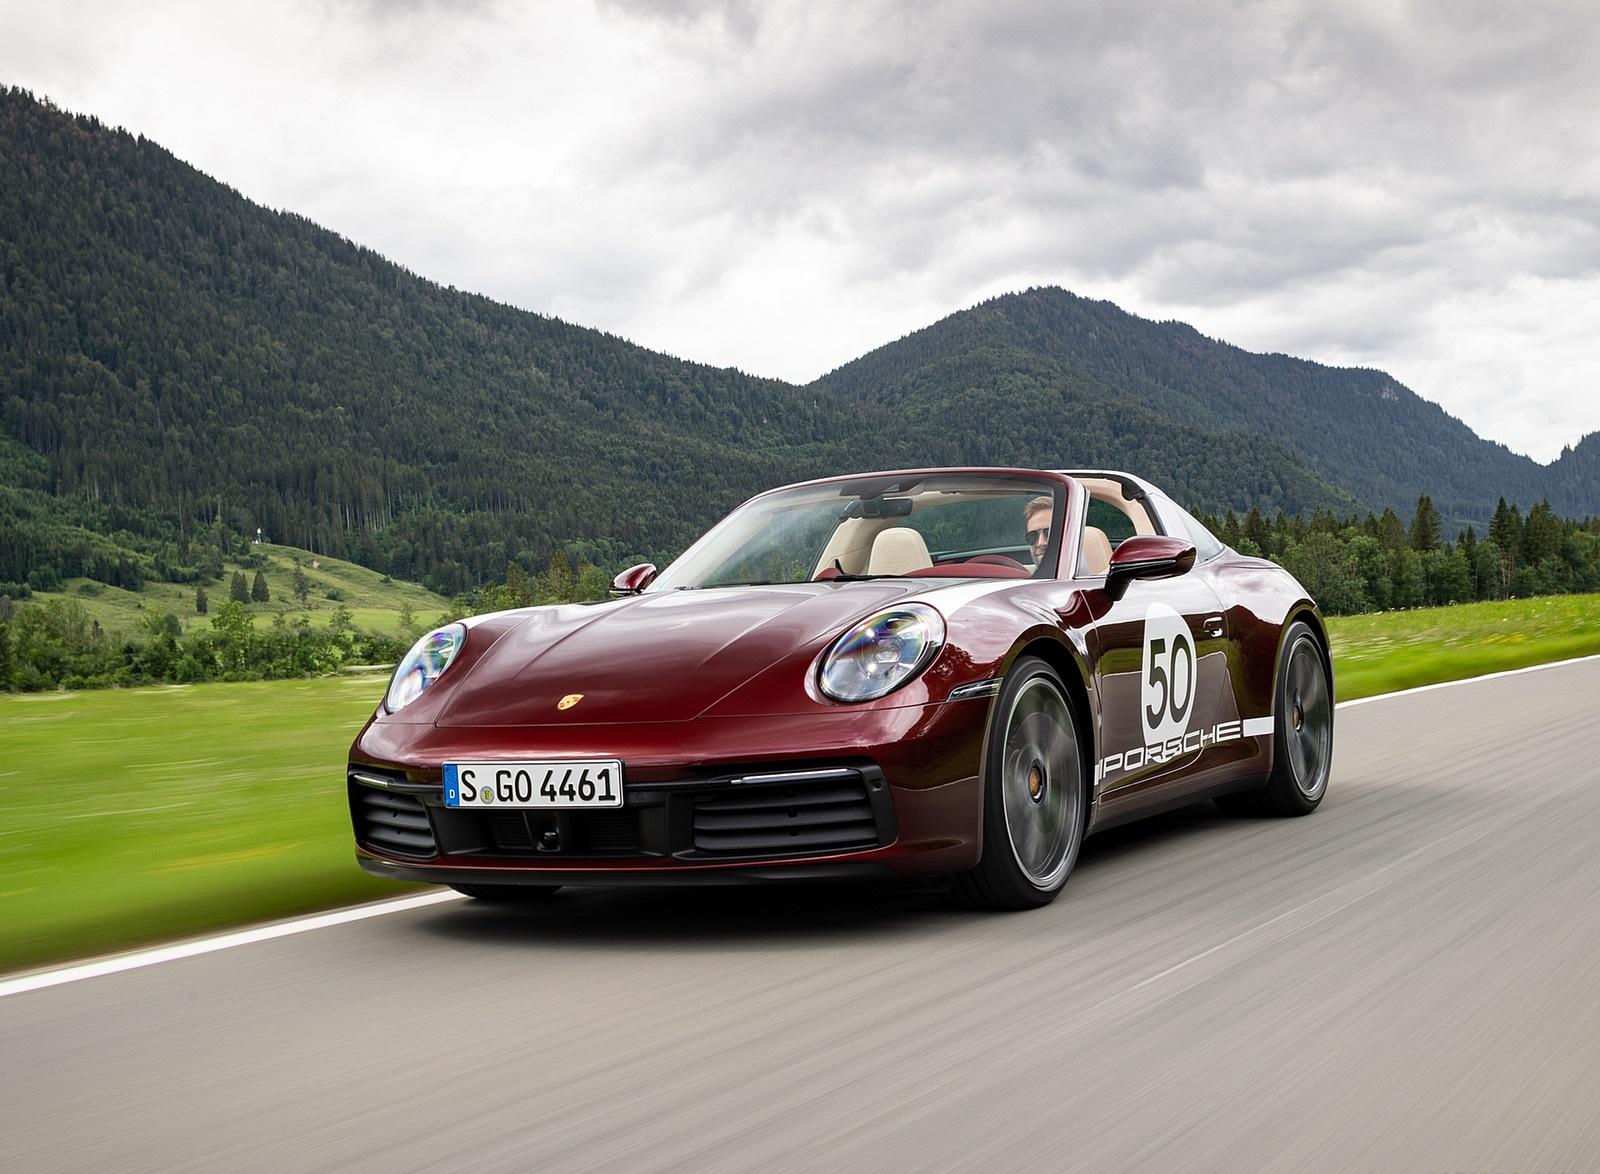 2021 Porsche 911 Targa 4S Heritage Design Edition (Color: Cherry Metallic) Front Three-Quarter Wallpapers (1)